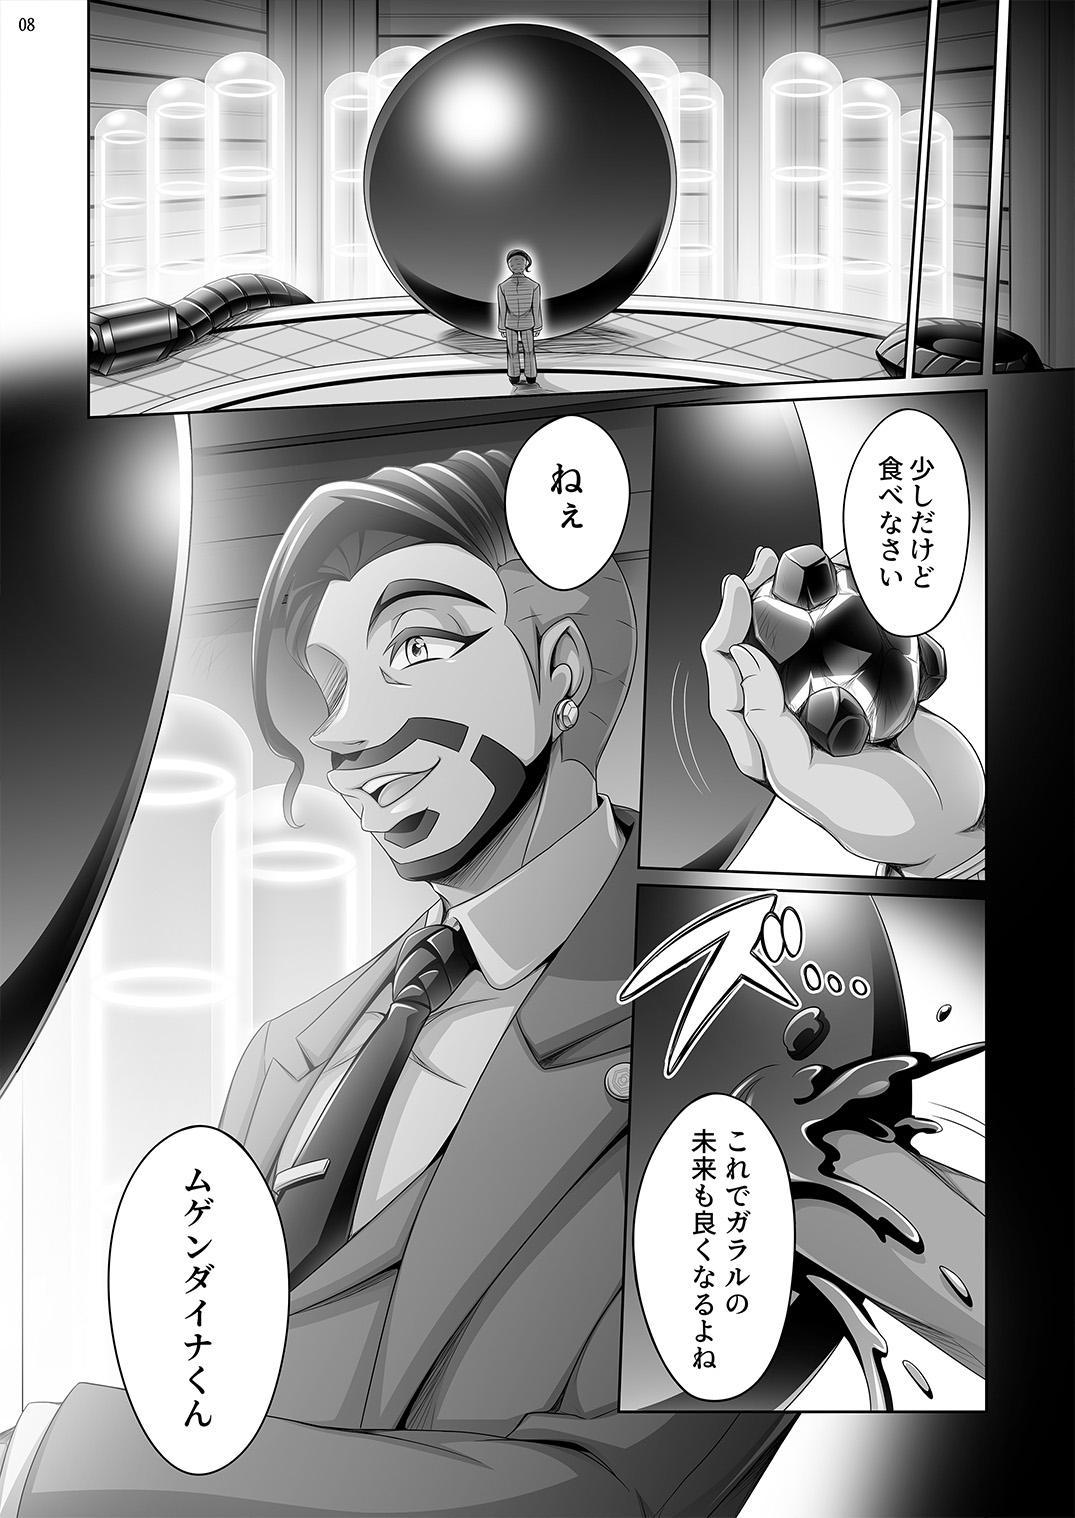 Shounen Beet no Kenshin 7